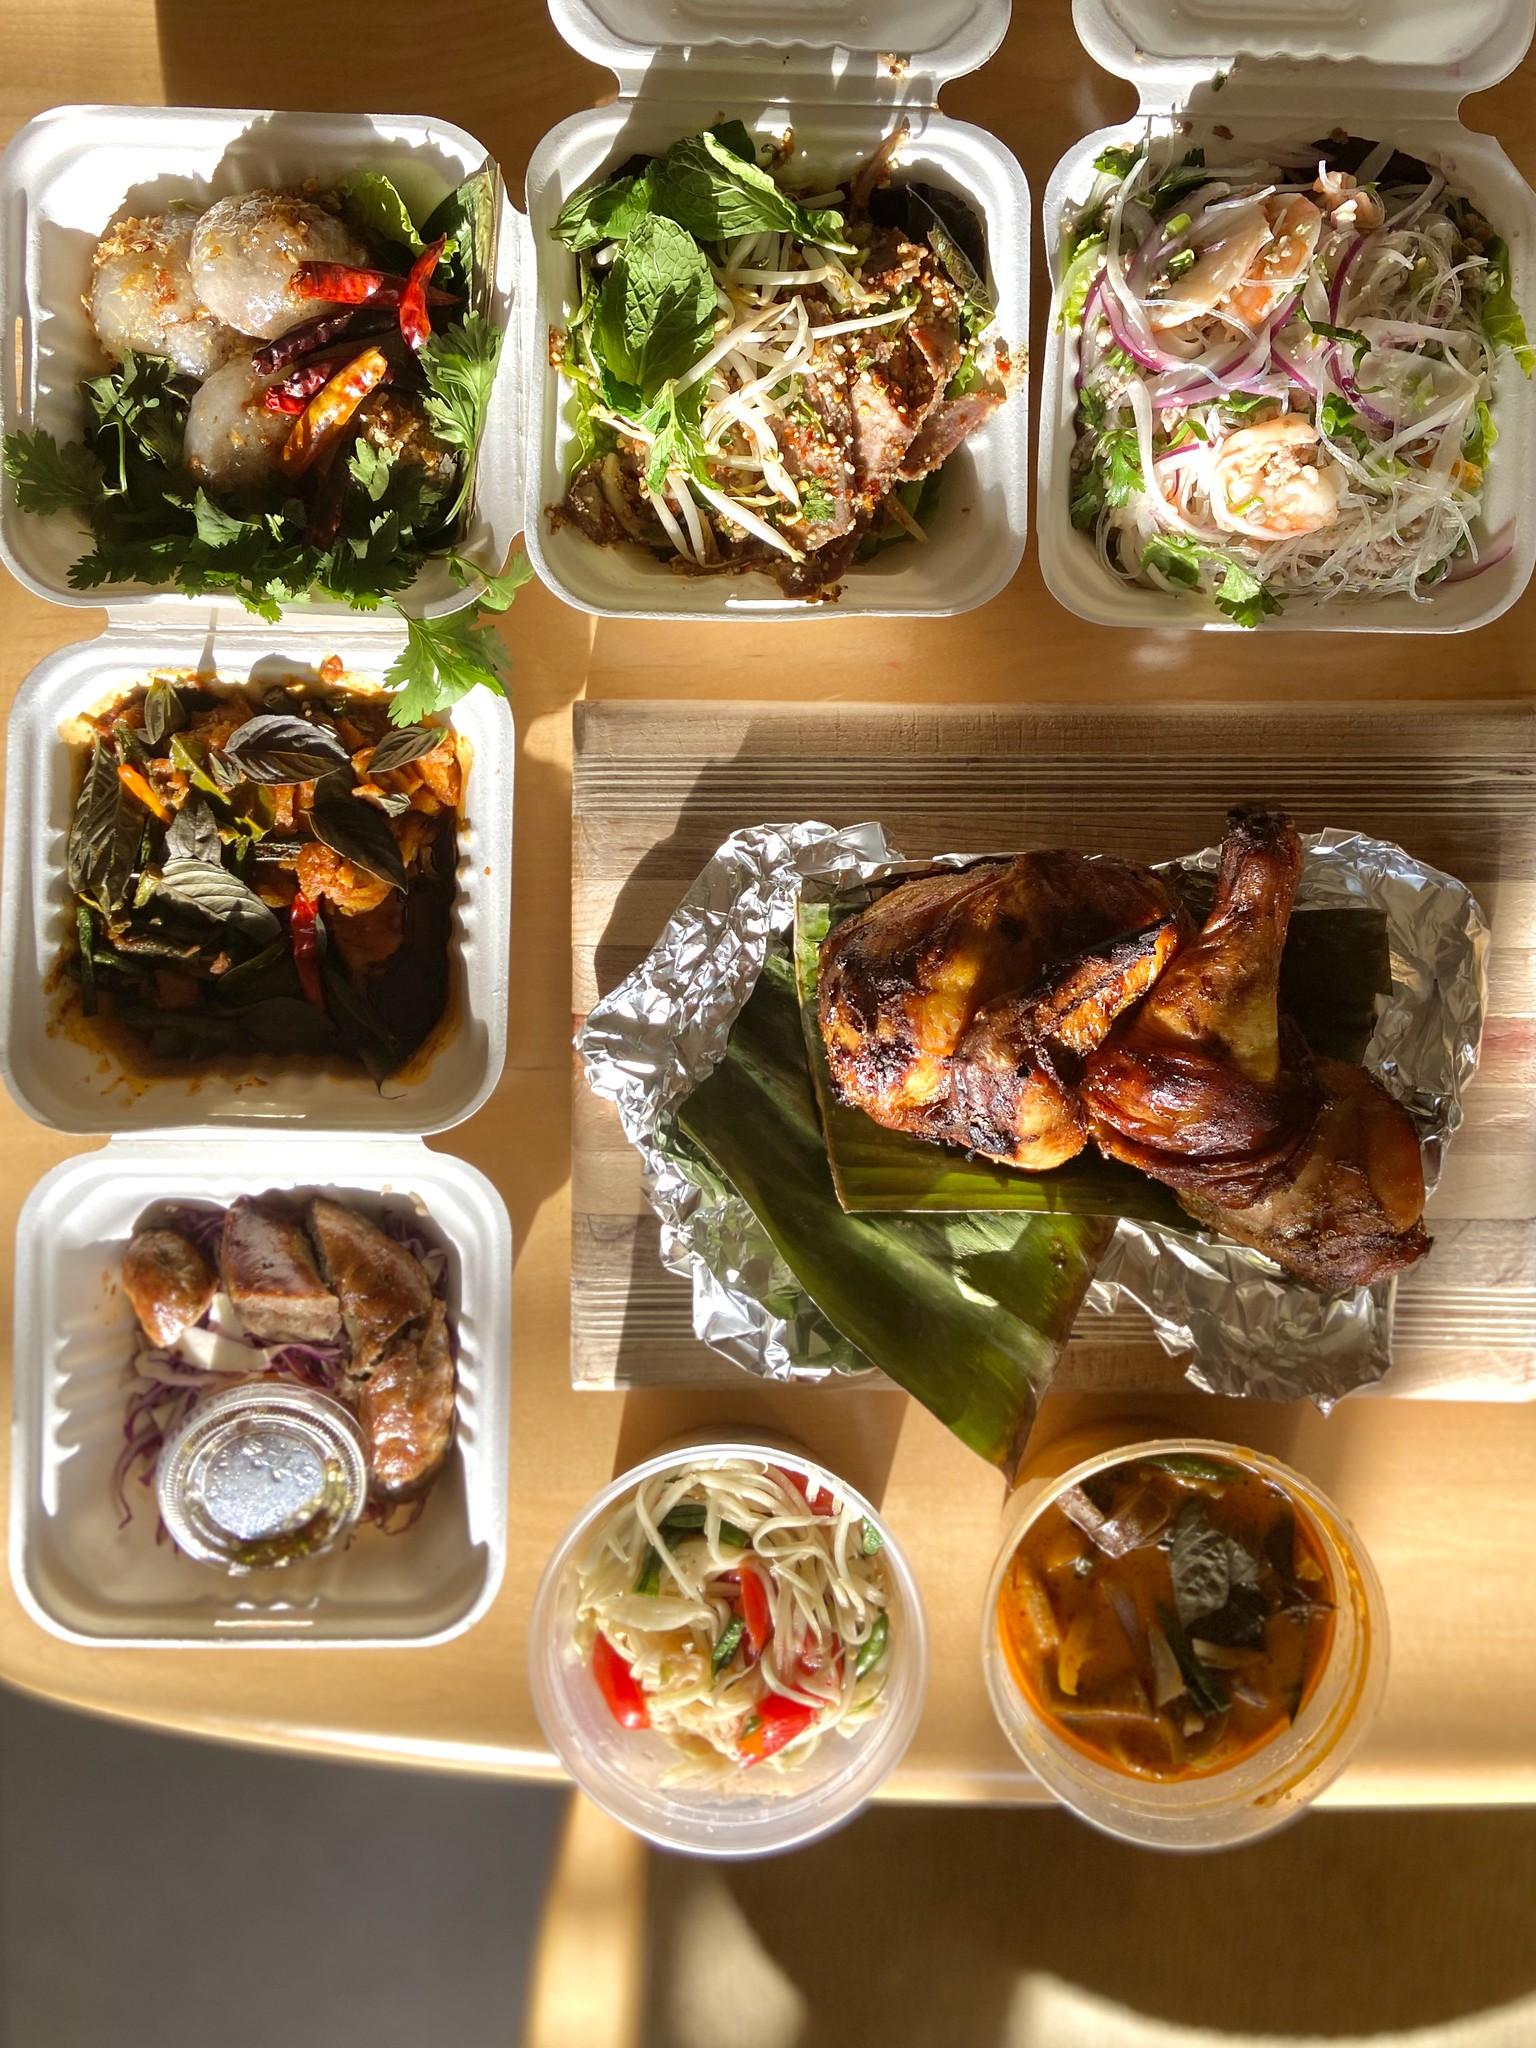 Isaan Rotisserie Chicken - Lil Laos